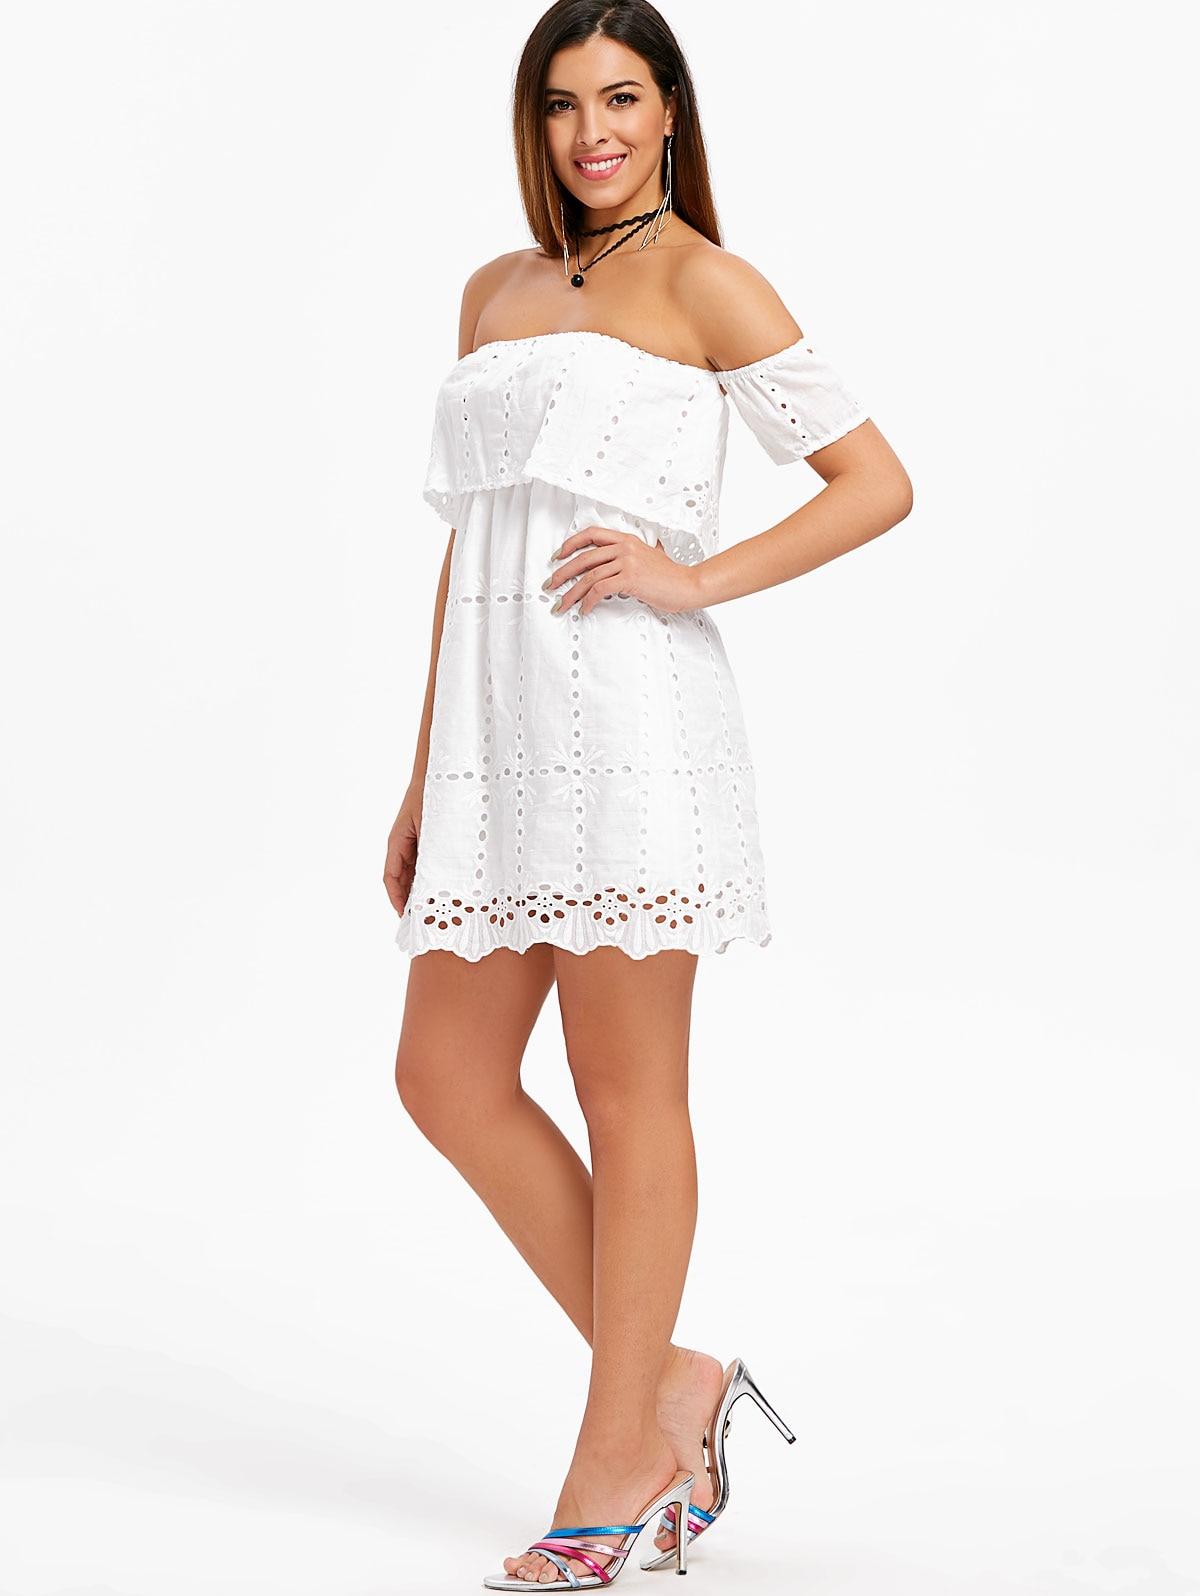 VESTLINDA Elastic Waist Hollow Out Off The Shoulder Dress Women Summer 2018 Short Mini White Dress Robe Femme Ladies Sun Dess